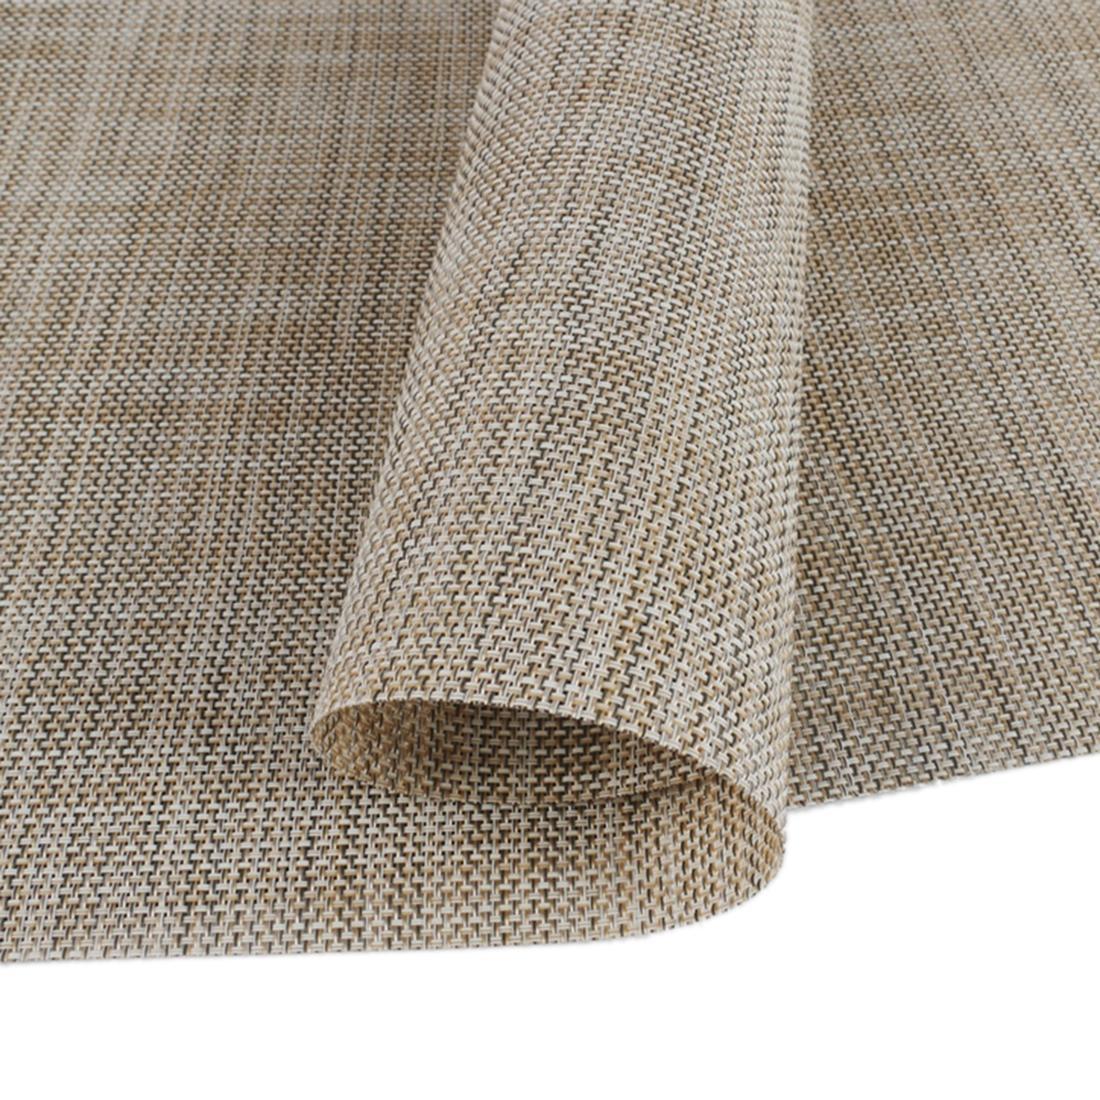 360DSC Simple Design Linentte Tableware Mat Table Runner KnitTablecloth Desk Cover - Beige